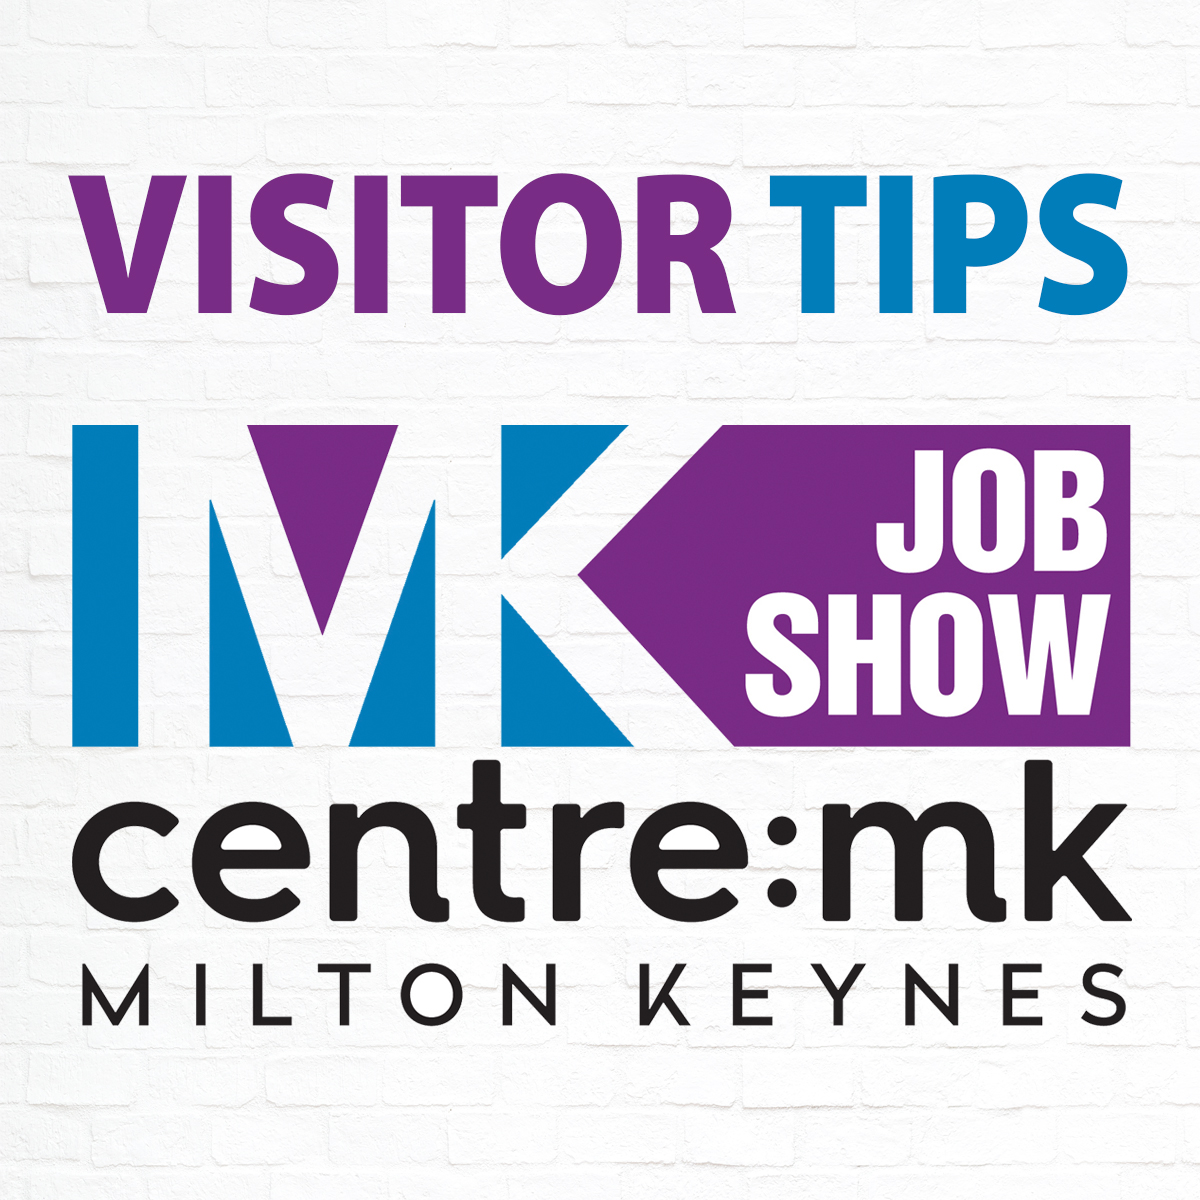 MK Job Show Visitor Tips